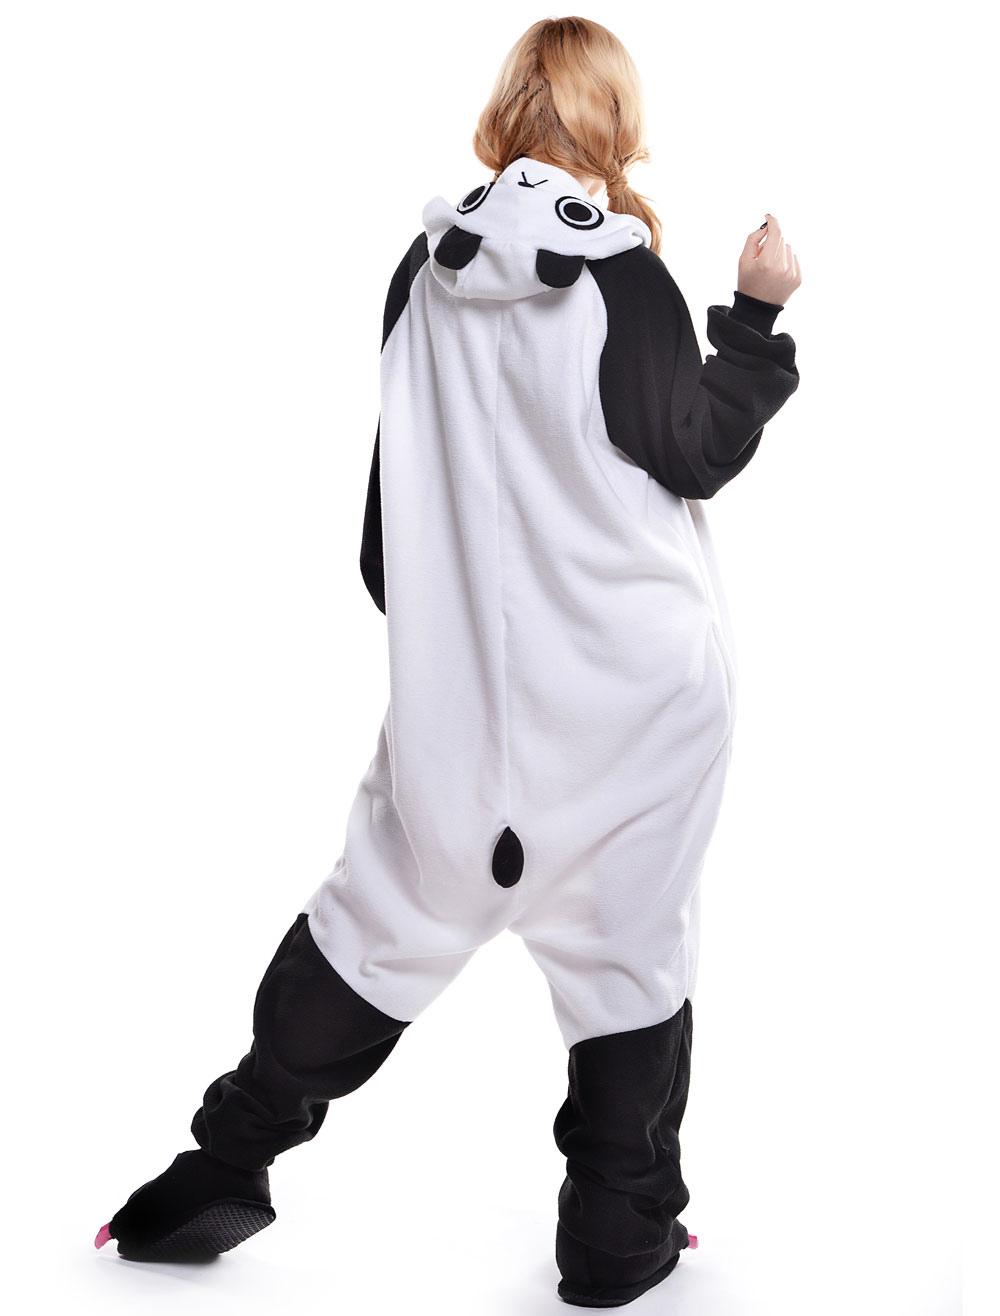 2c59ff0851 ... Kigurumi Pajama Panda Onesie For Adult fleeceFlannel Black White Animal  Costume Halloween-No.7